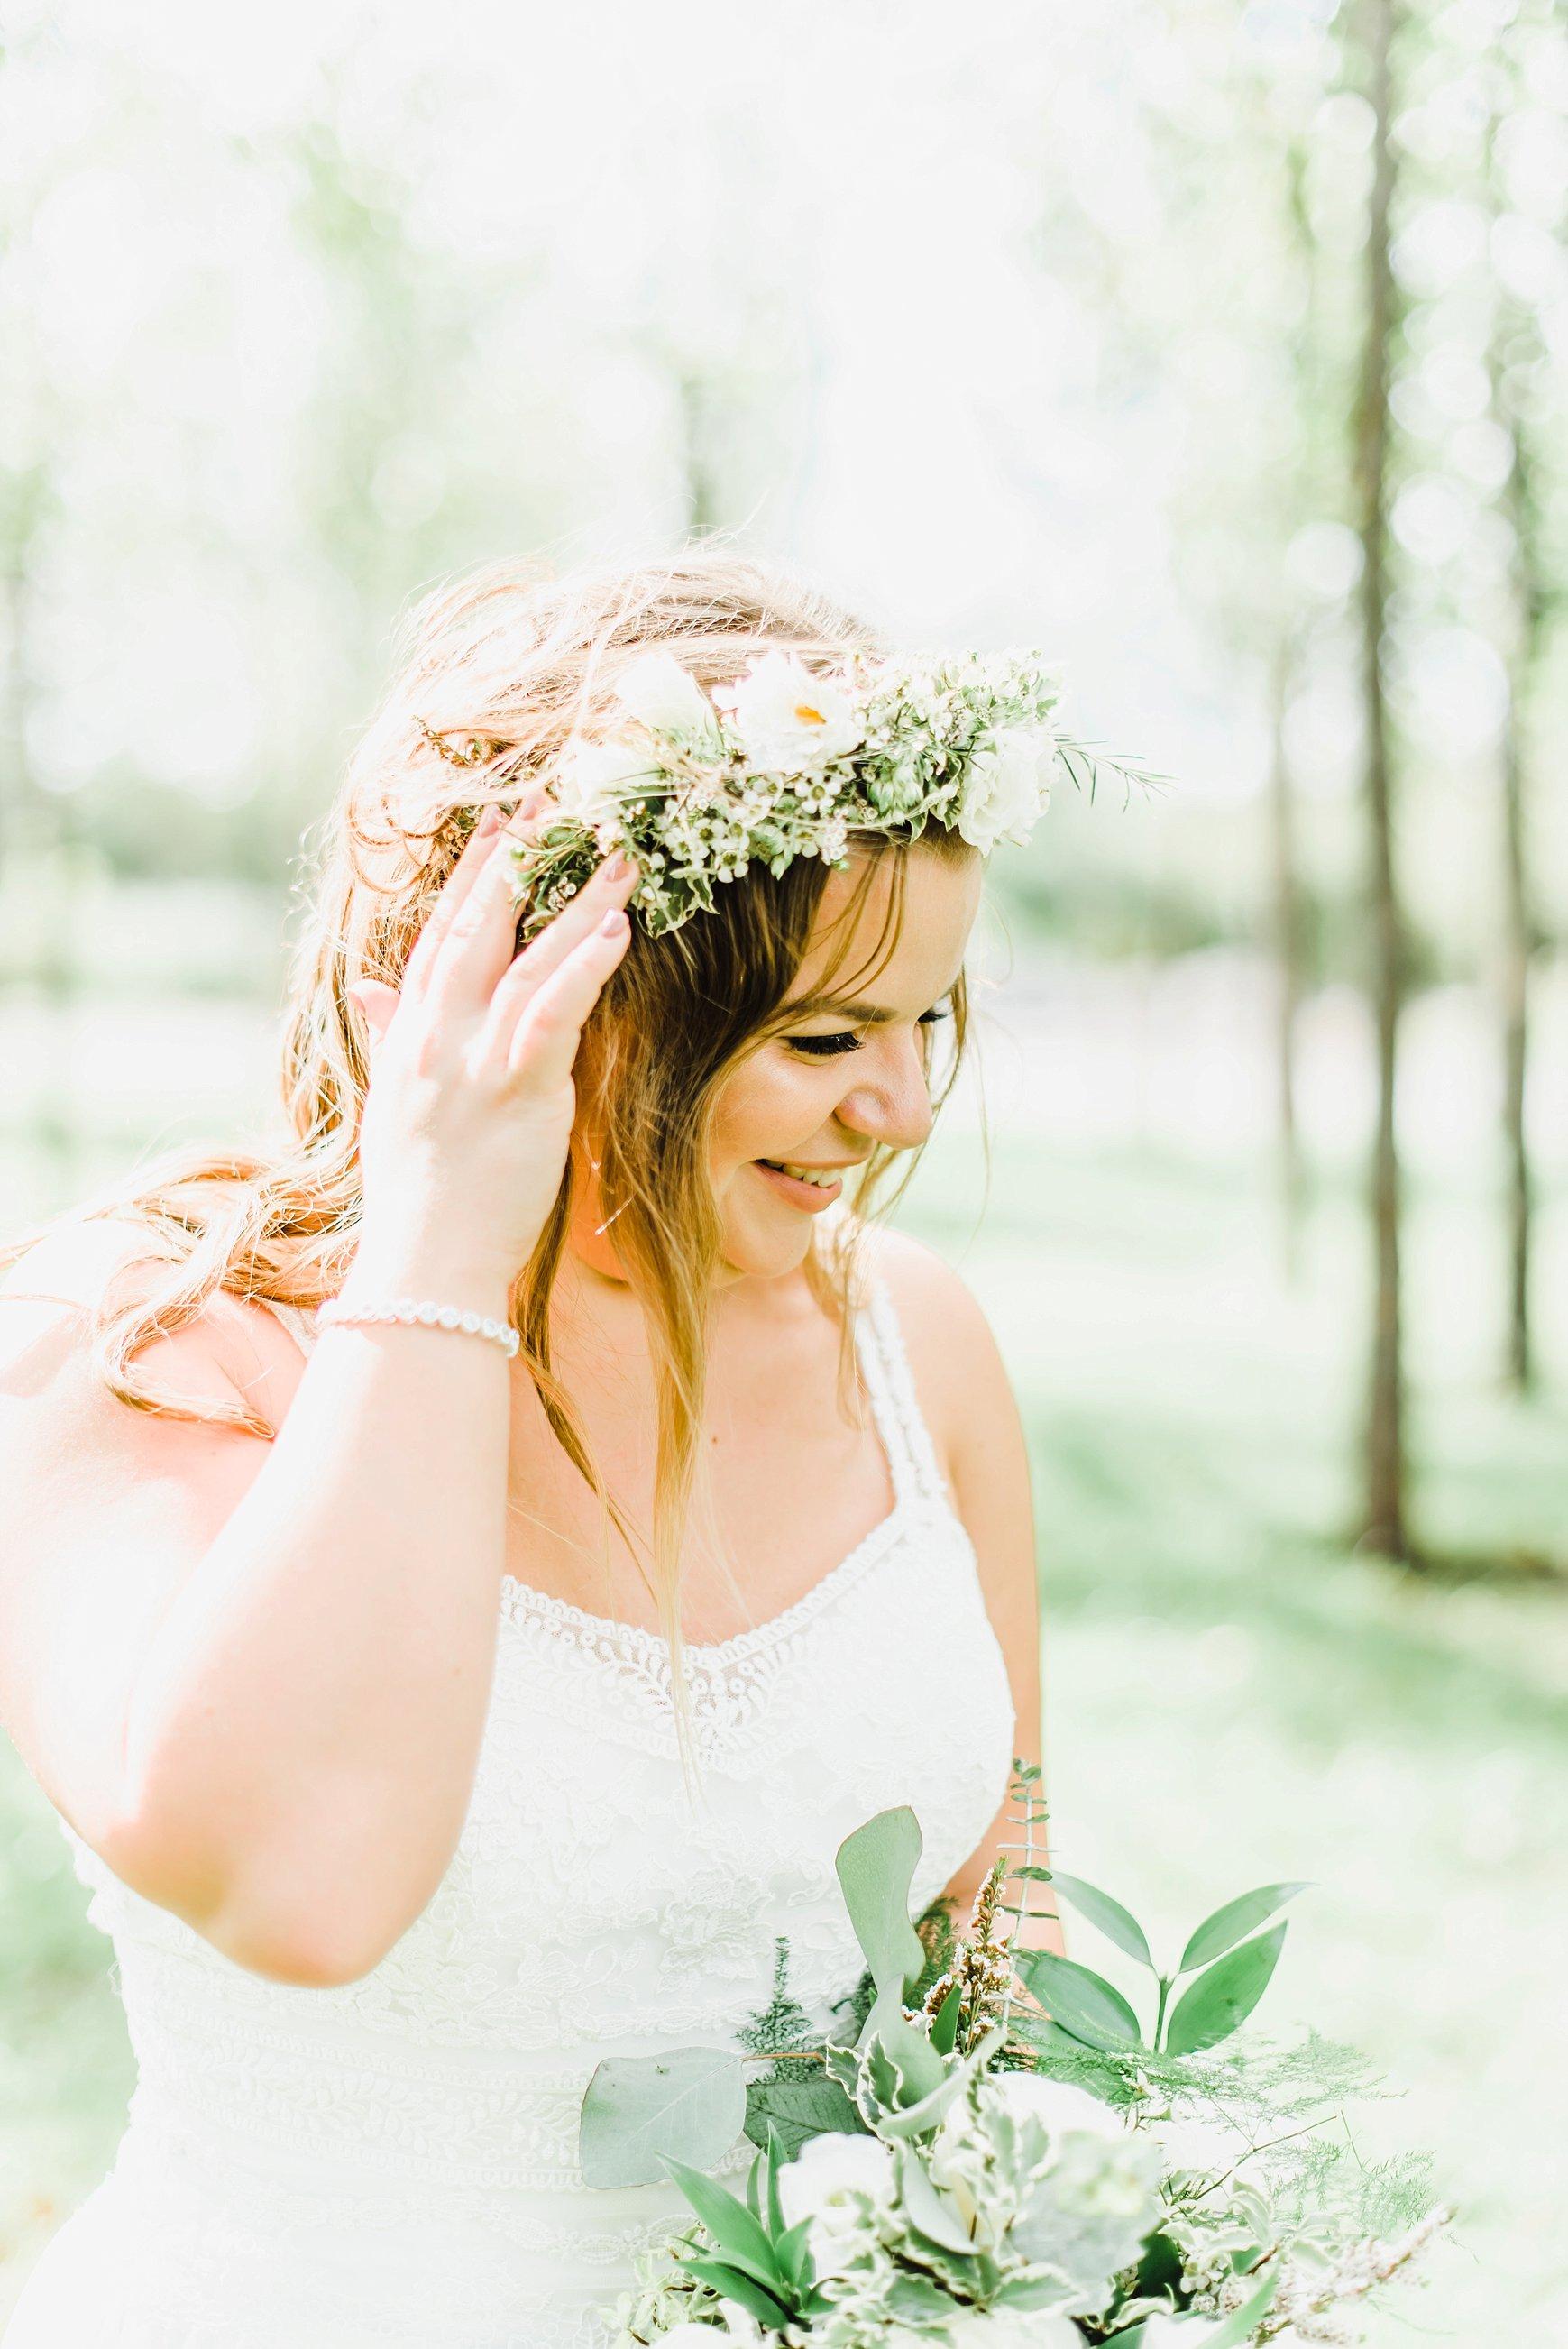 light airy indie fine art ottawa wedding photographer | Ali and Batoul Photography_1119.jpg